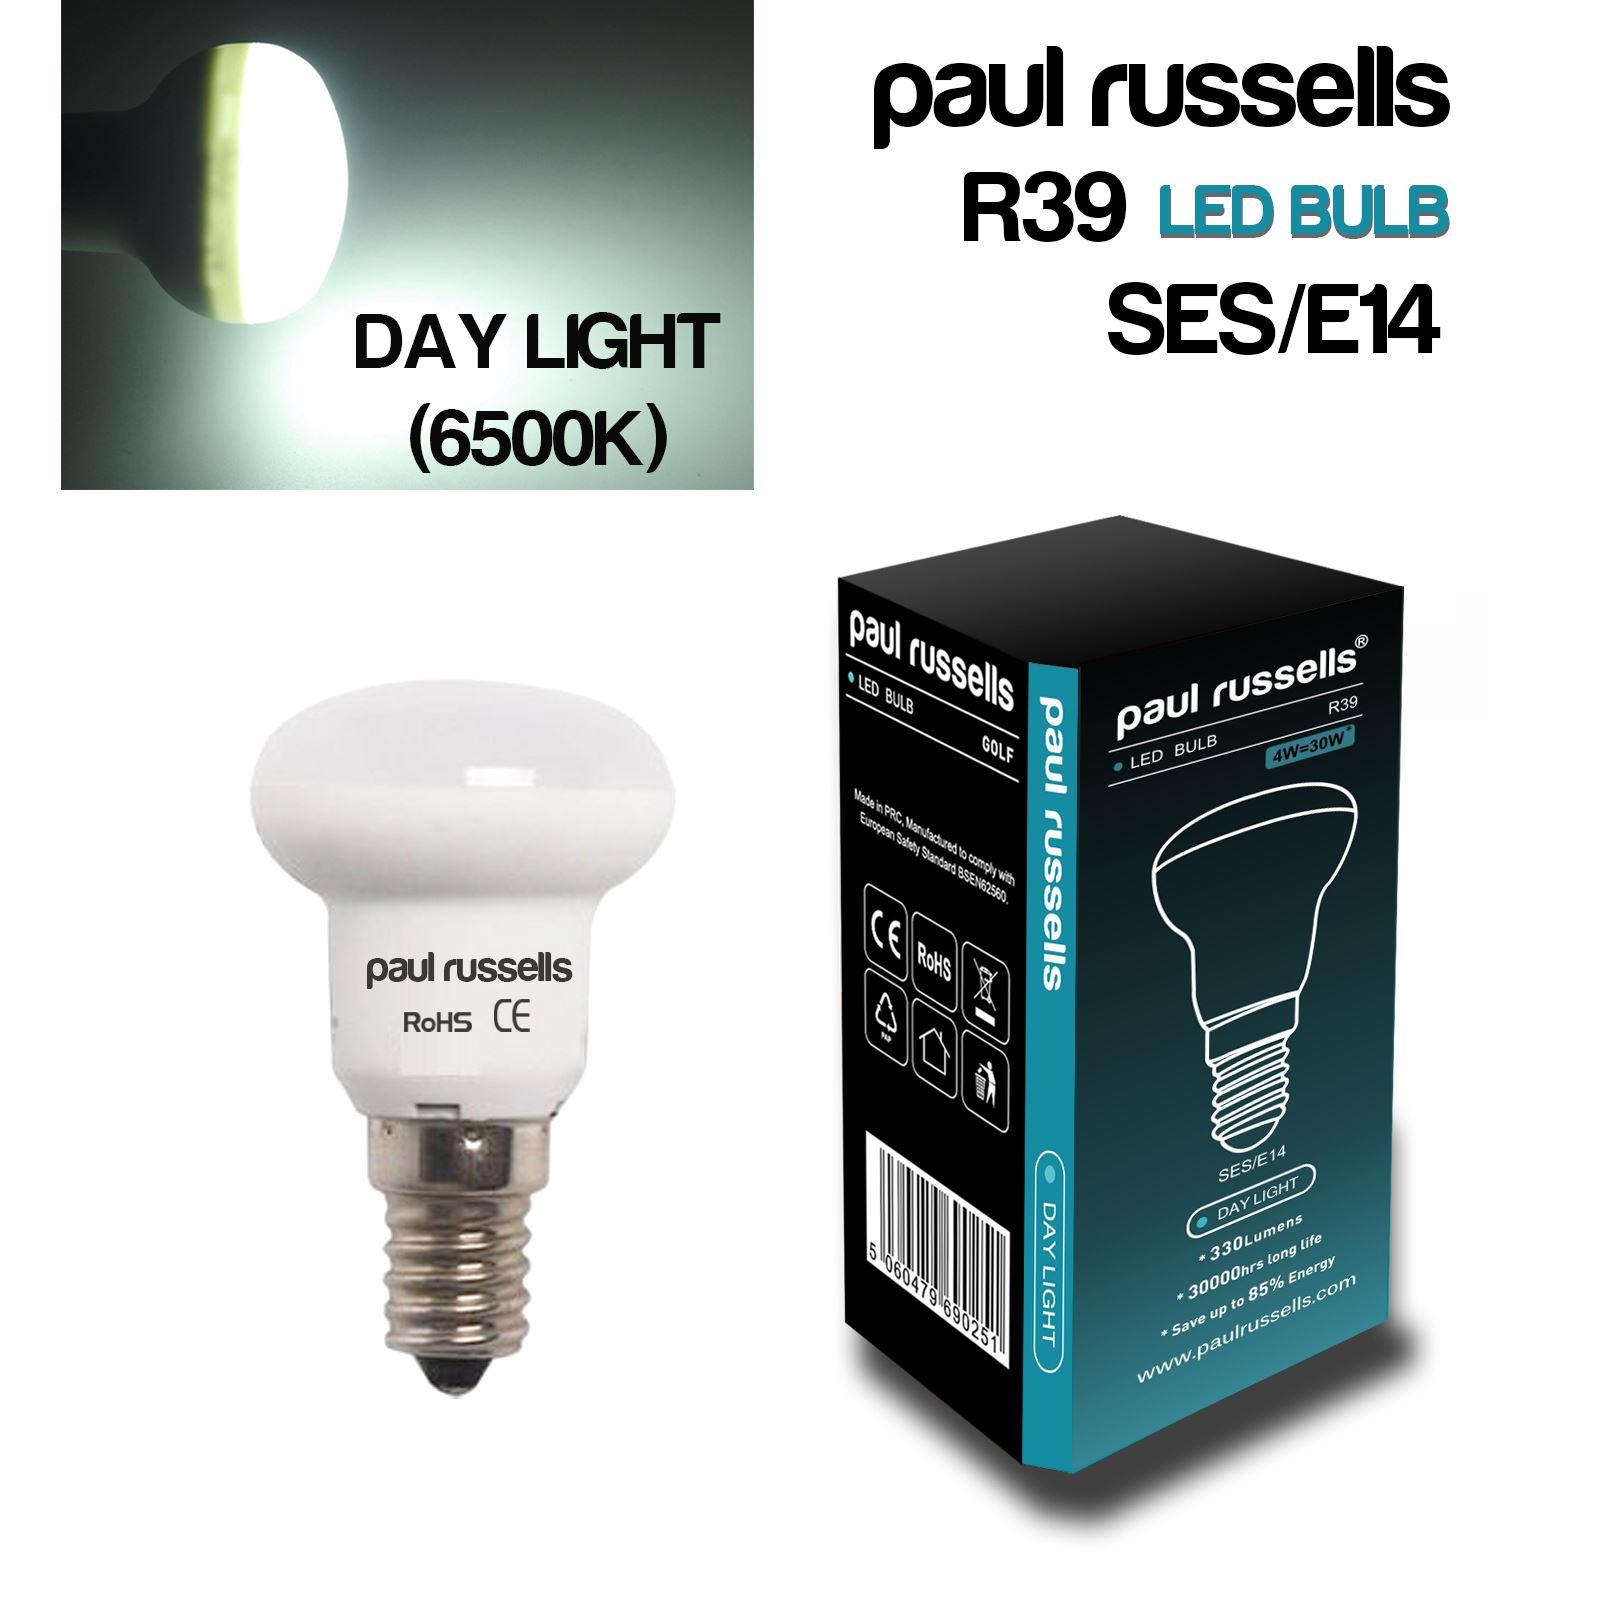 led e27 e14 reflector bulb 30w 40w 65w 100w spot light lamp r39 r50 r63 r80 ebay. Black Bedroom Furniture Sets. Home Design Ideas